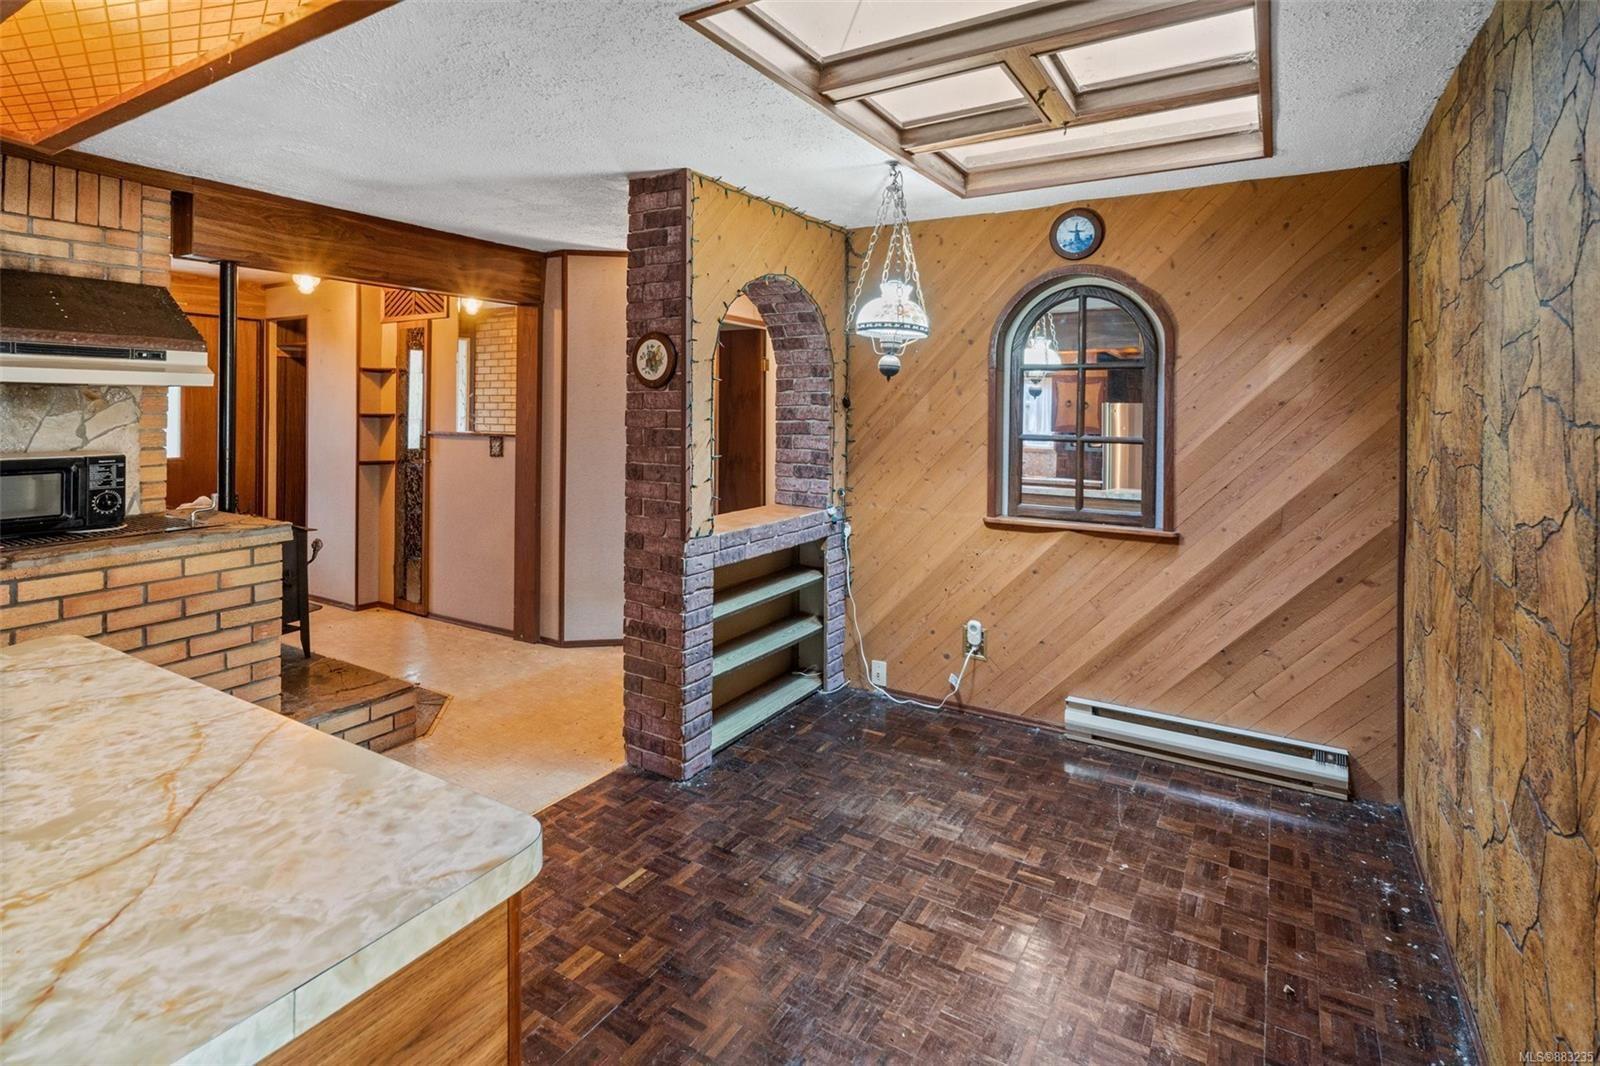 Photo 18: Photos: 6542 Thornett Rd in : Sk East Sooke House for sale (Sooke)  : MLS®# 883235